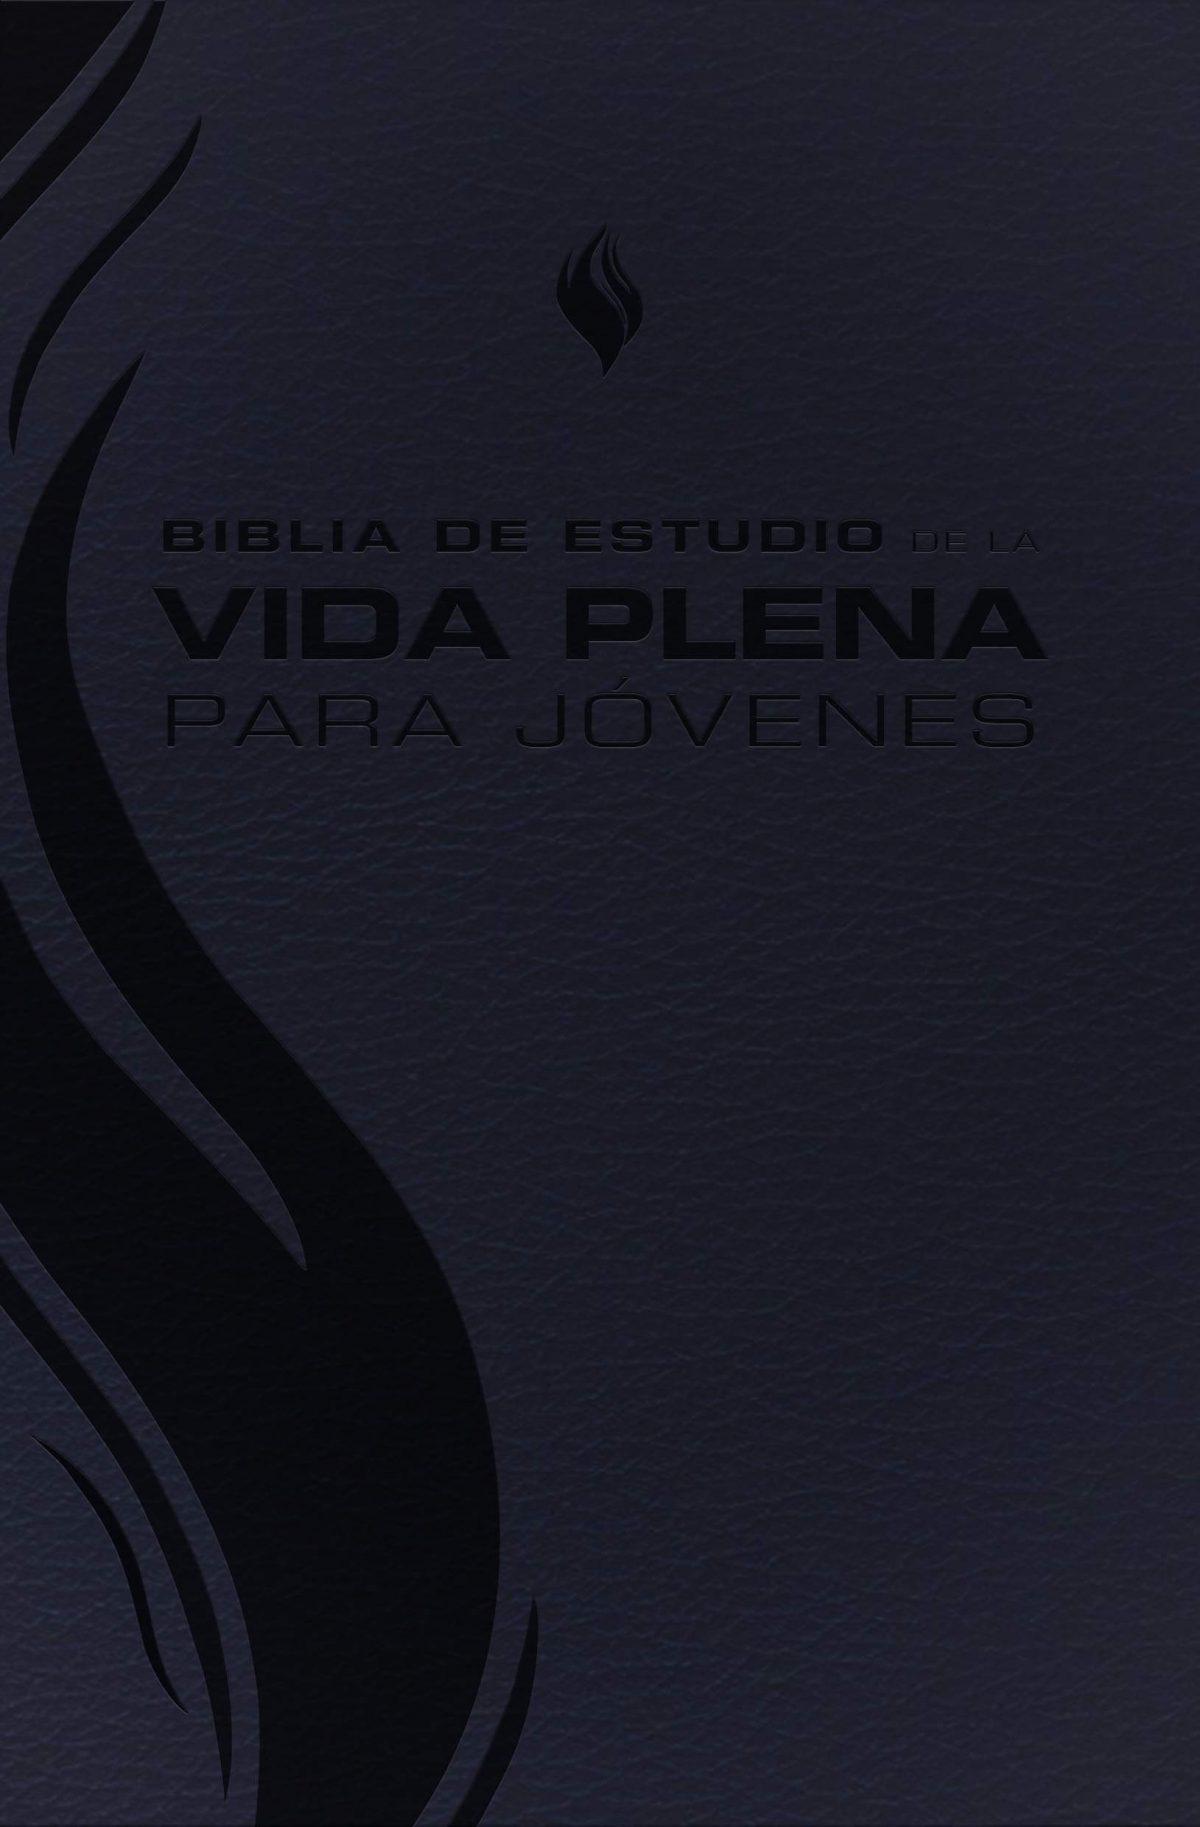 BIBLIA DE ESTUDIO DE LA  VIDA PLENA  PARA JOVENES - NEGRO